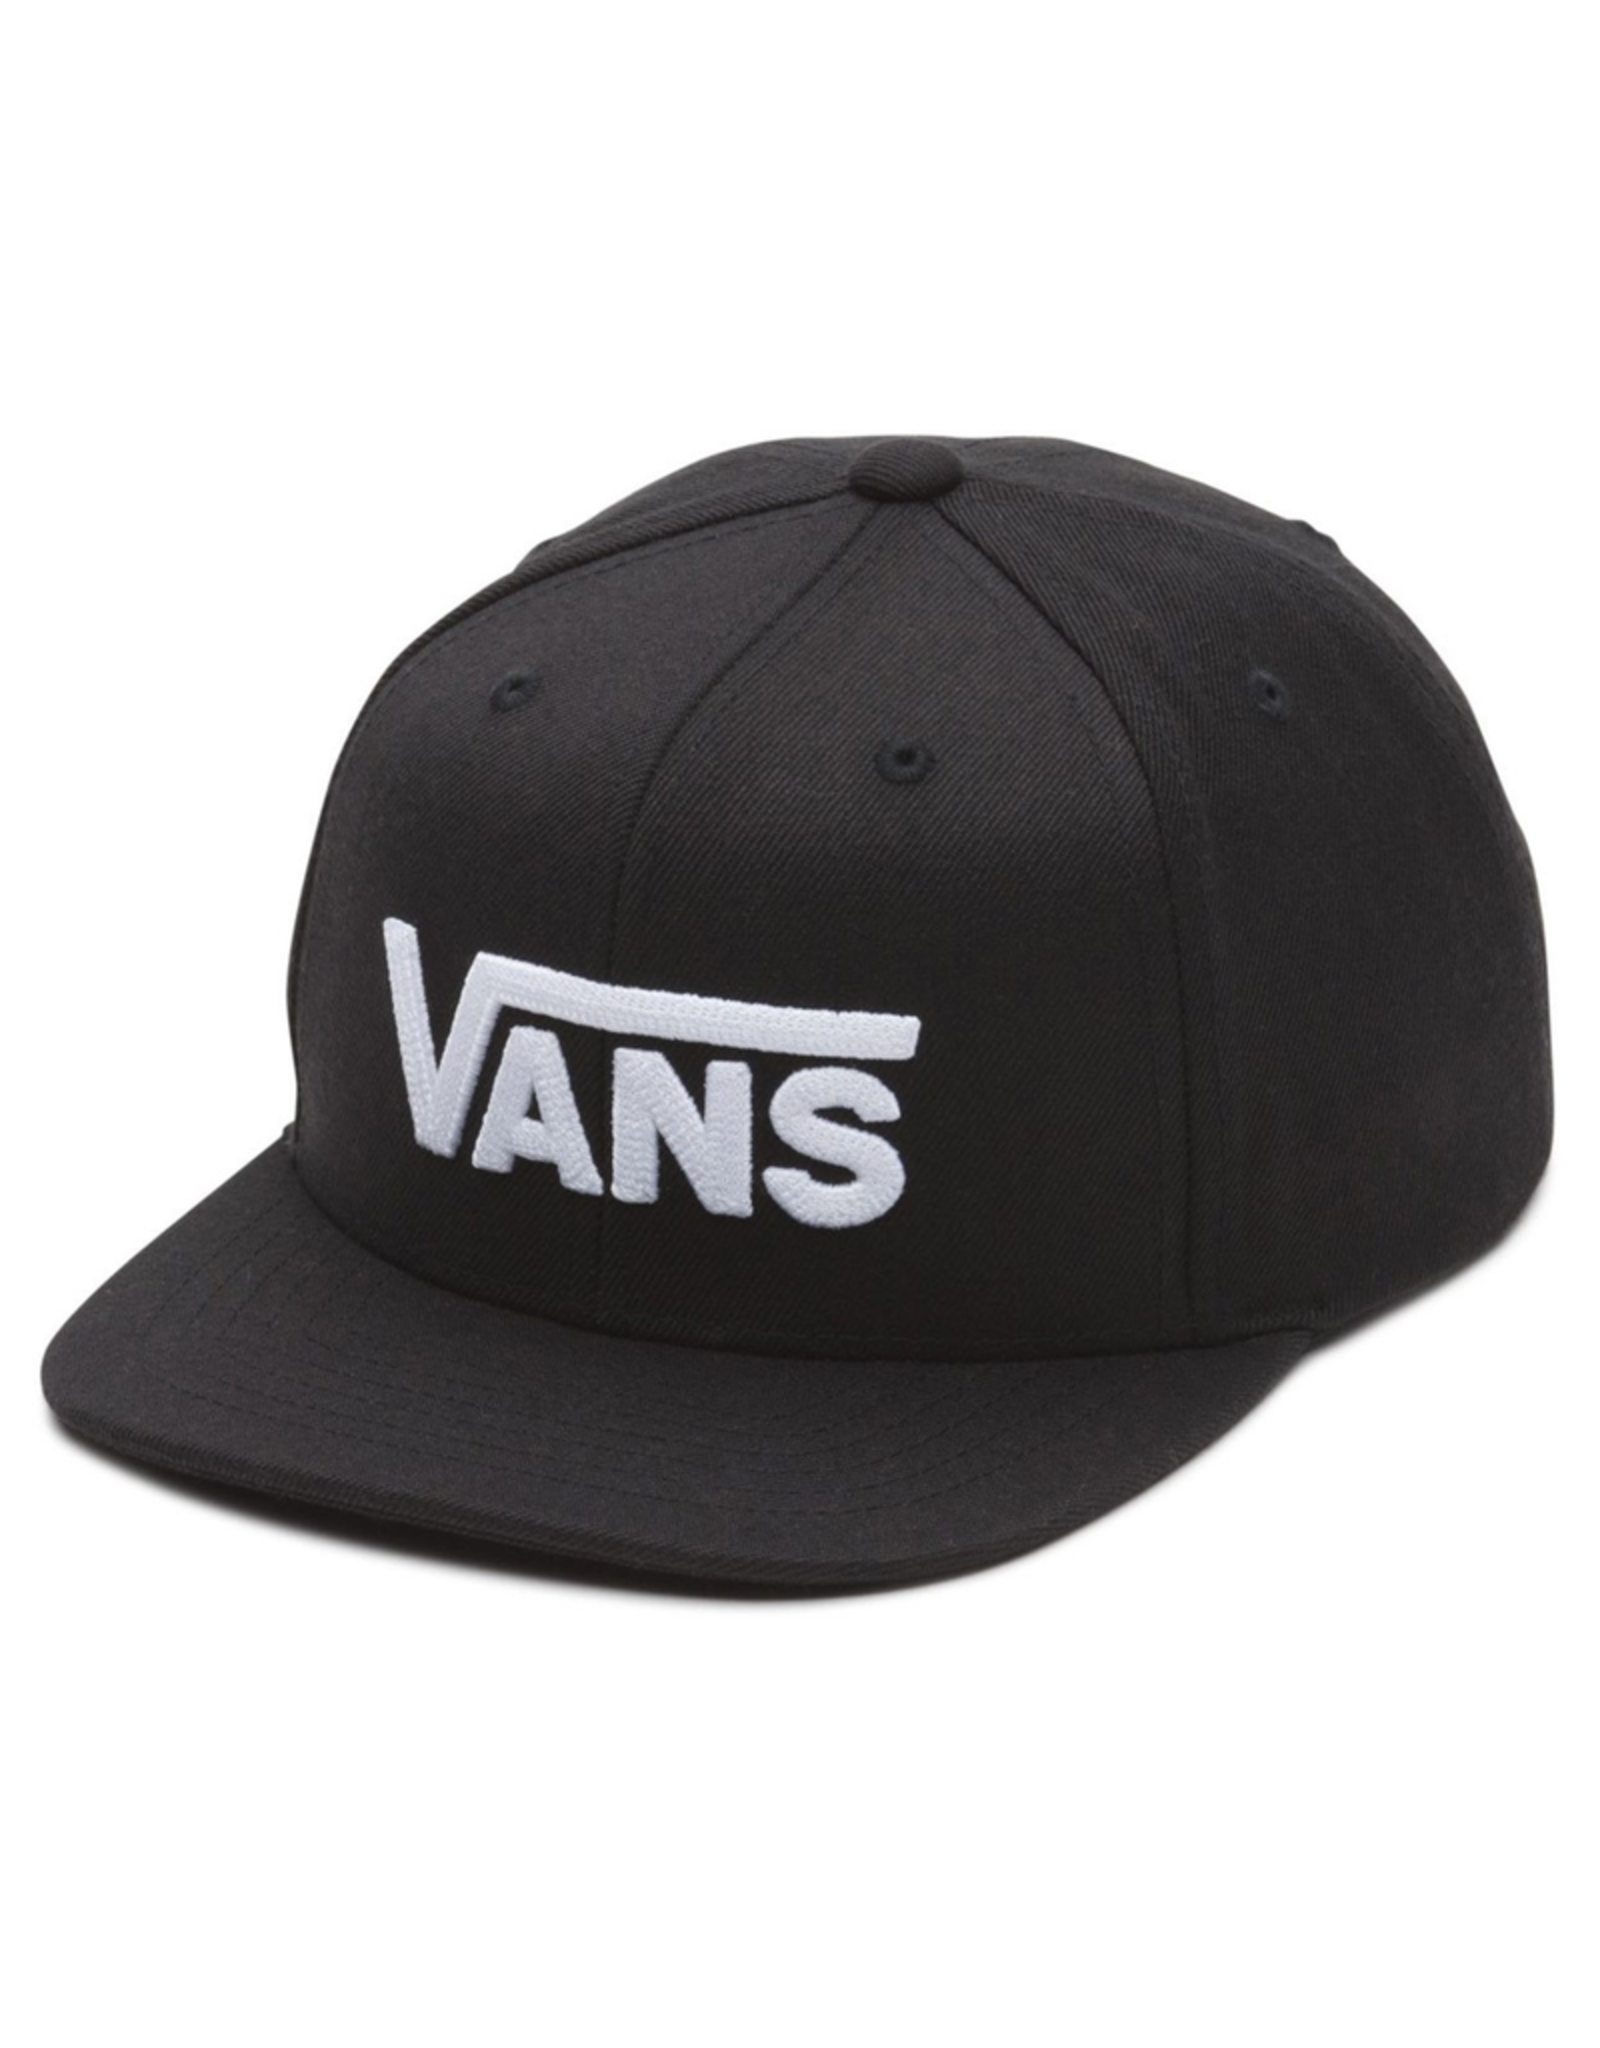 Vans Drop V II Snapback - Black/White